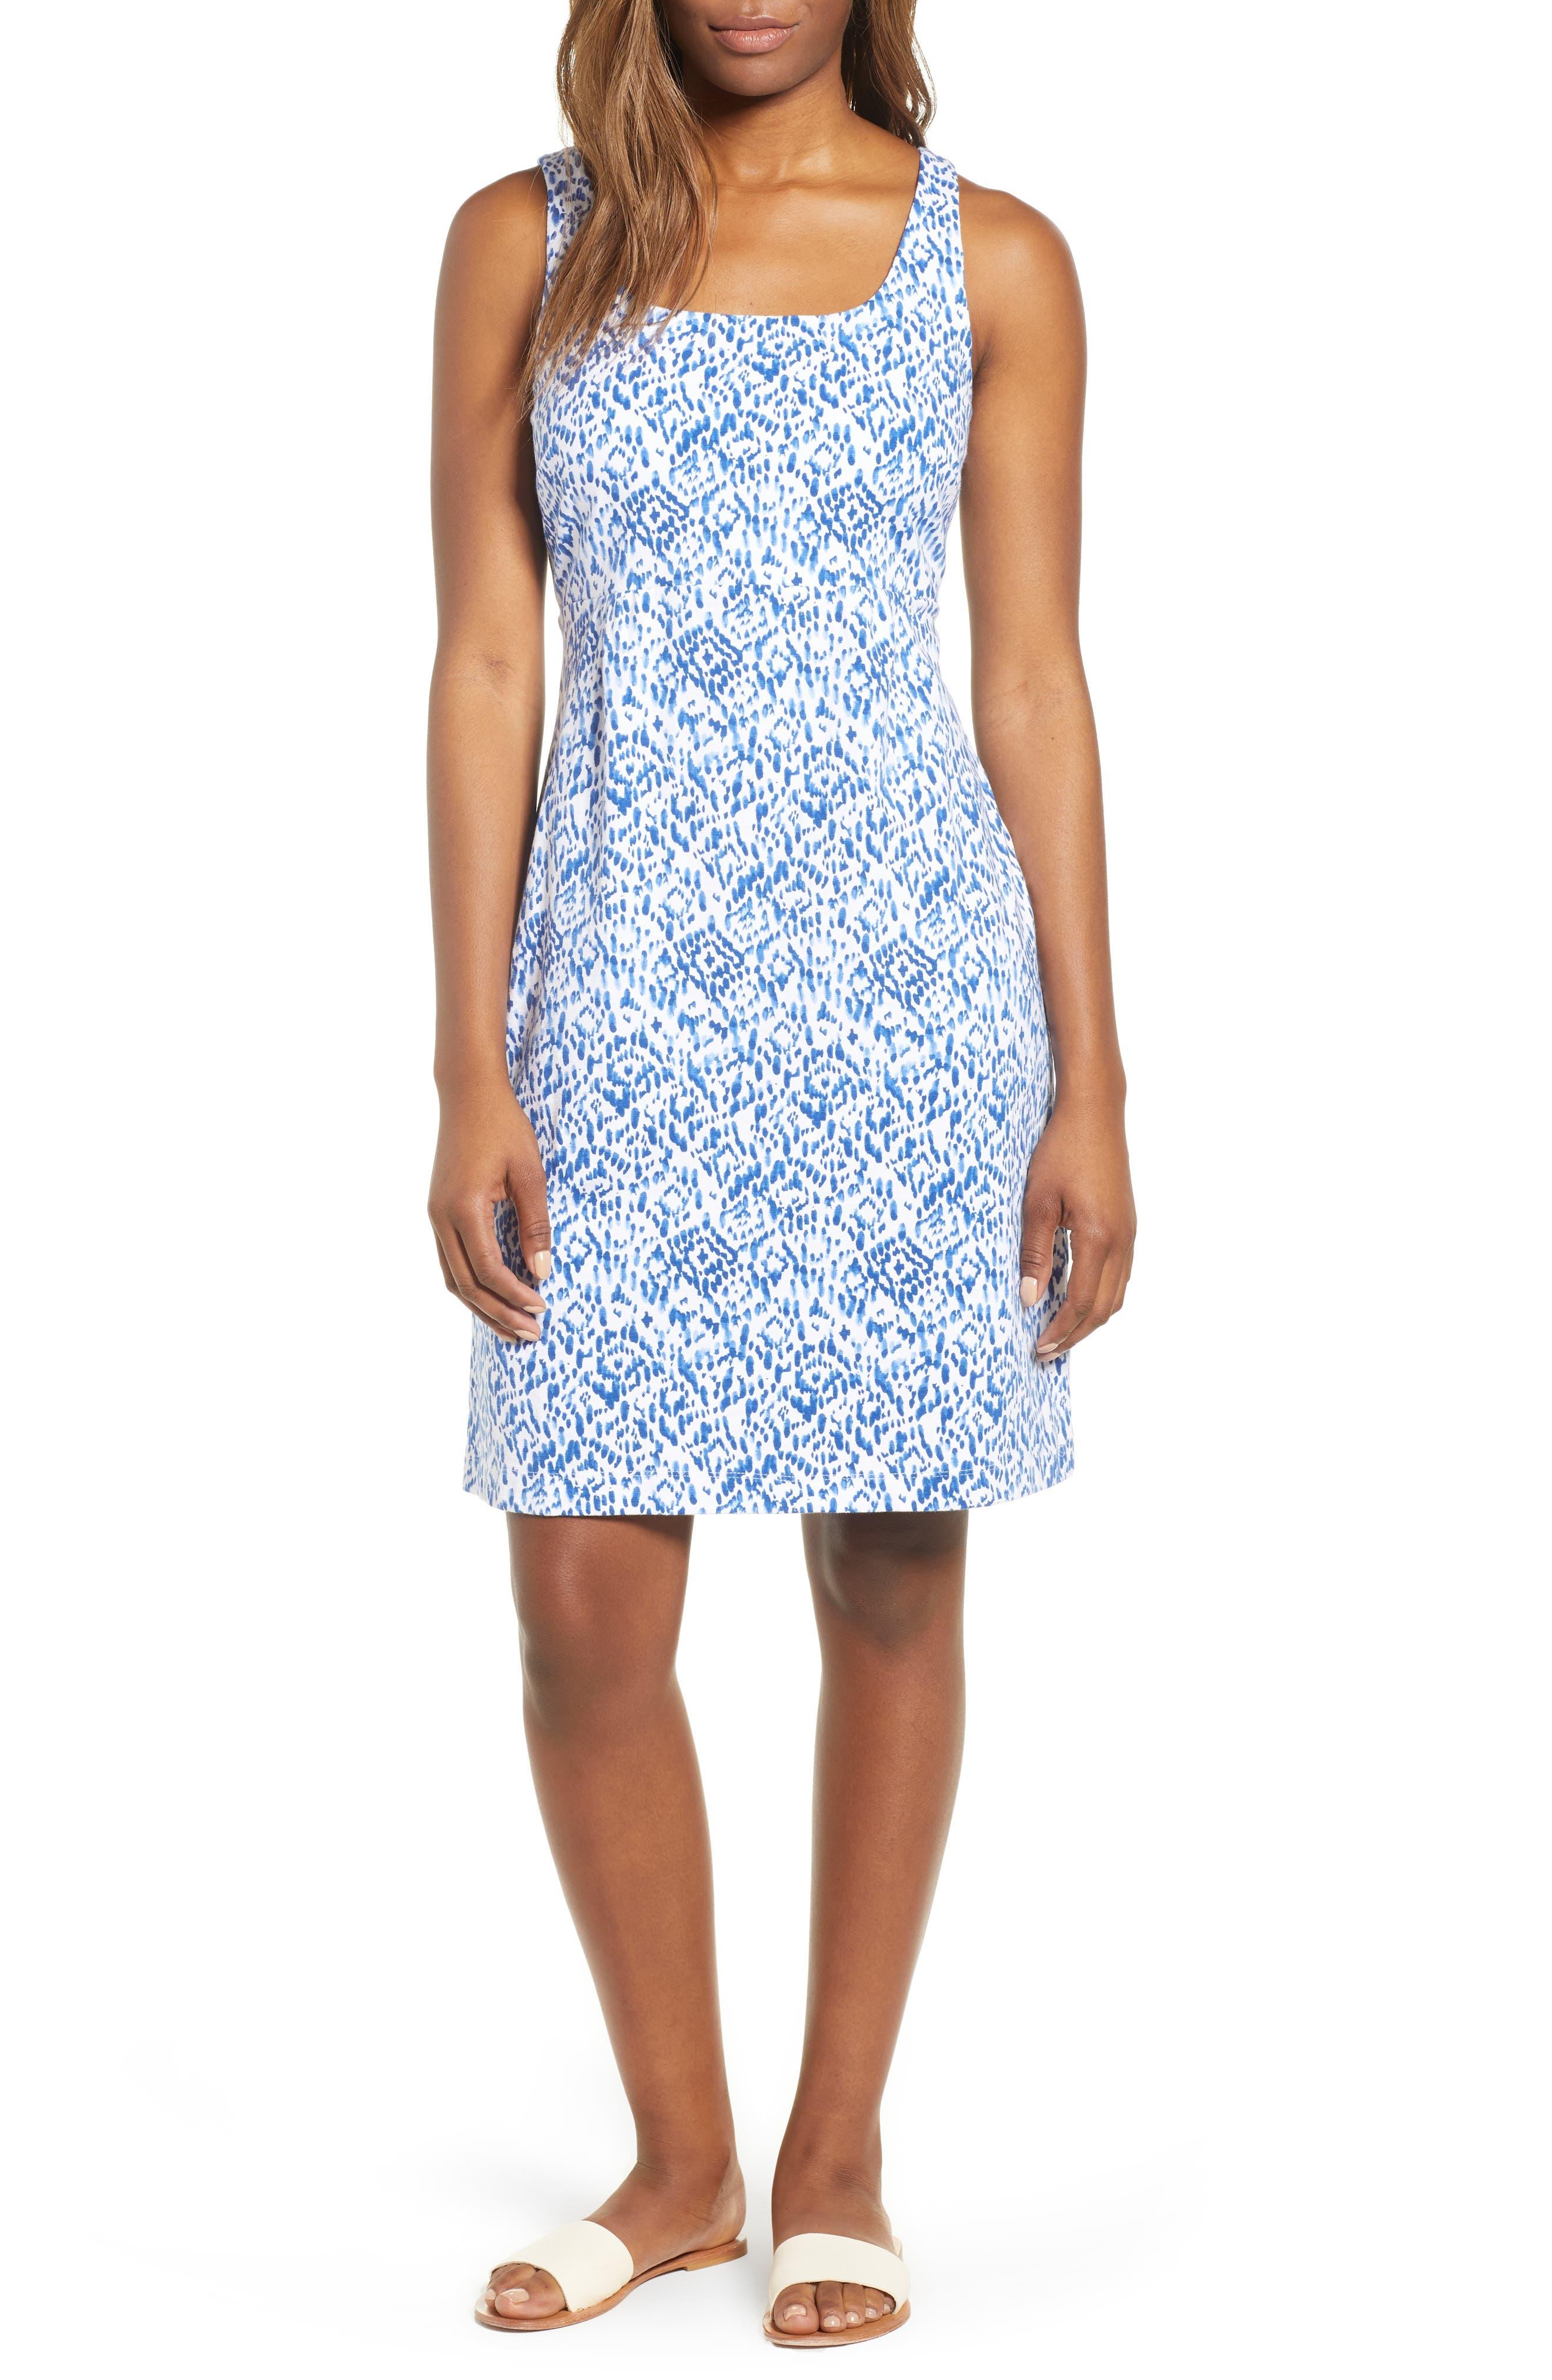 La Liorena Sleeveless Stretch Cotton Tank Dress,                         Main,                         color, 400